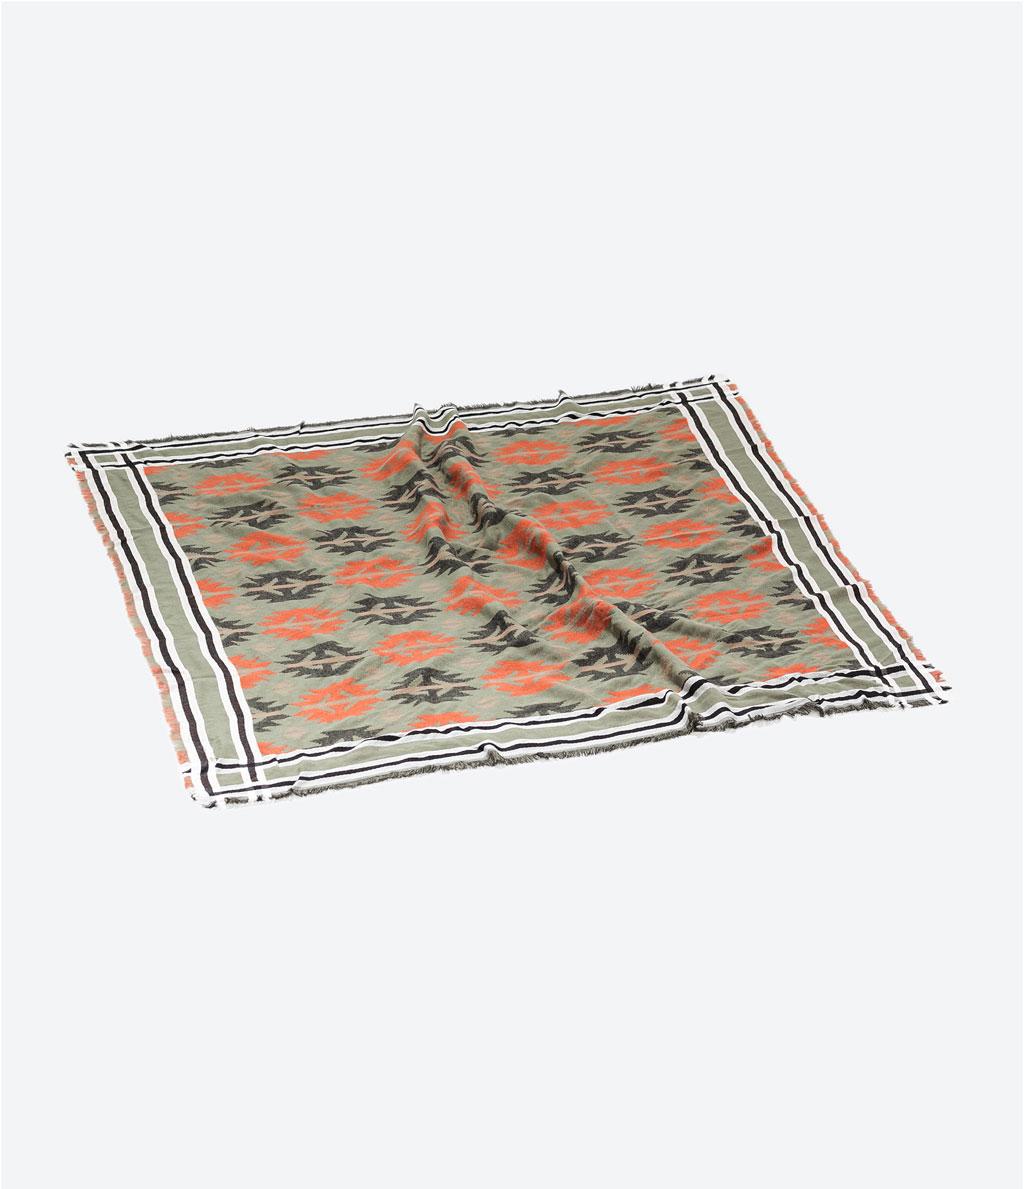 zarablanketscarf2.jpg